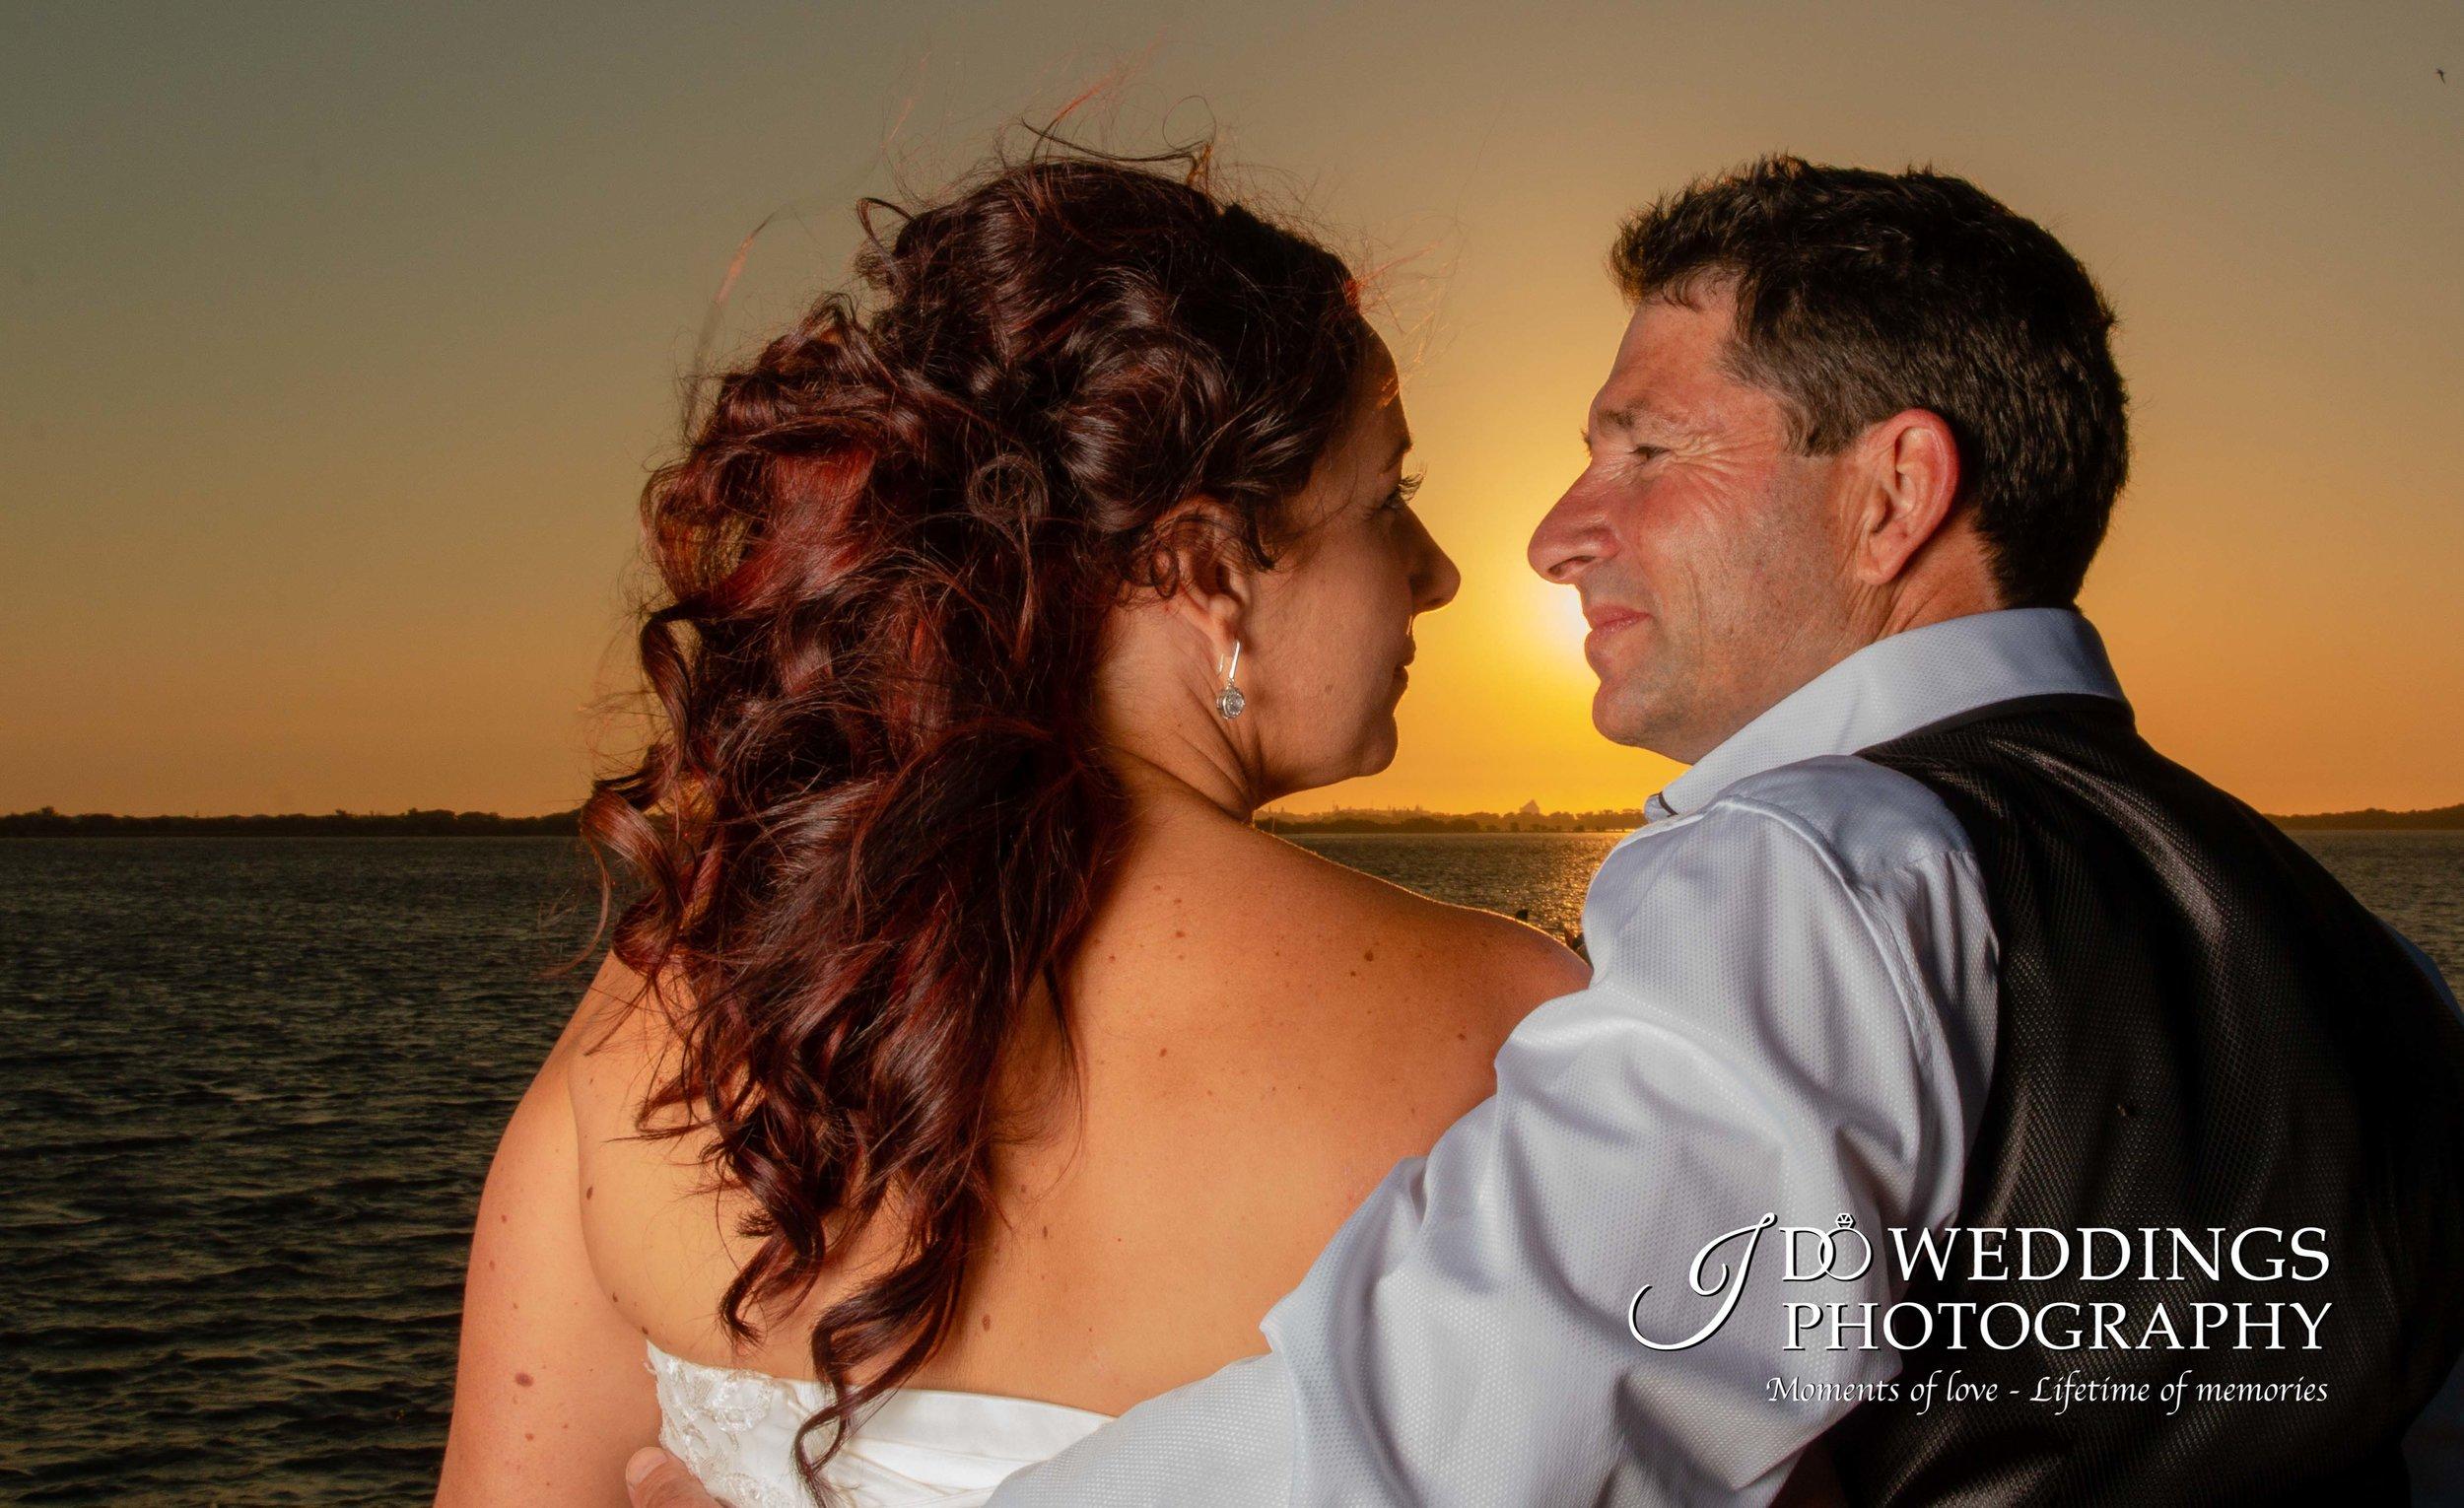 wedding images23.jpg